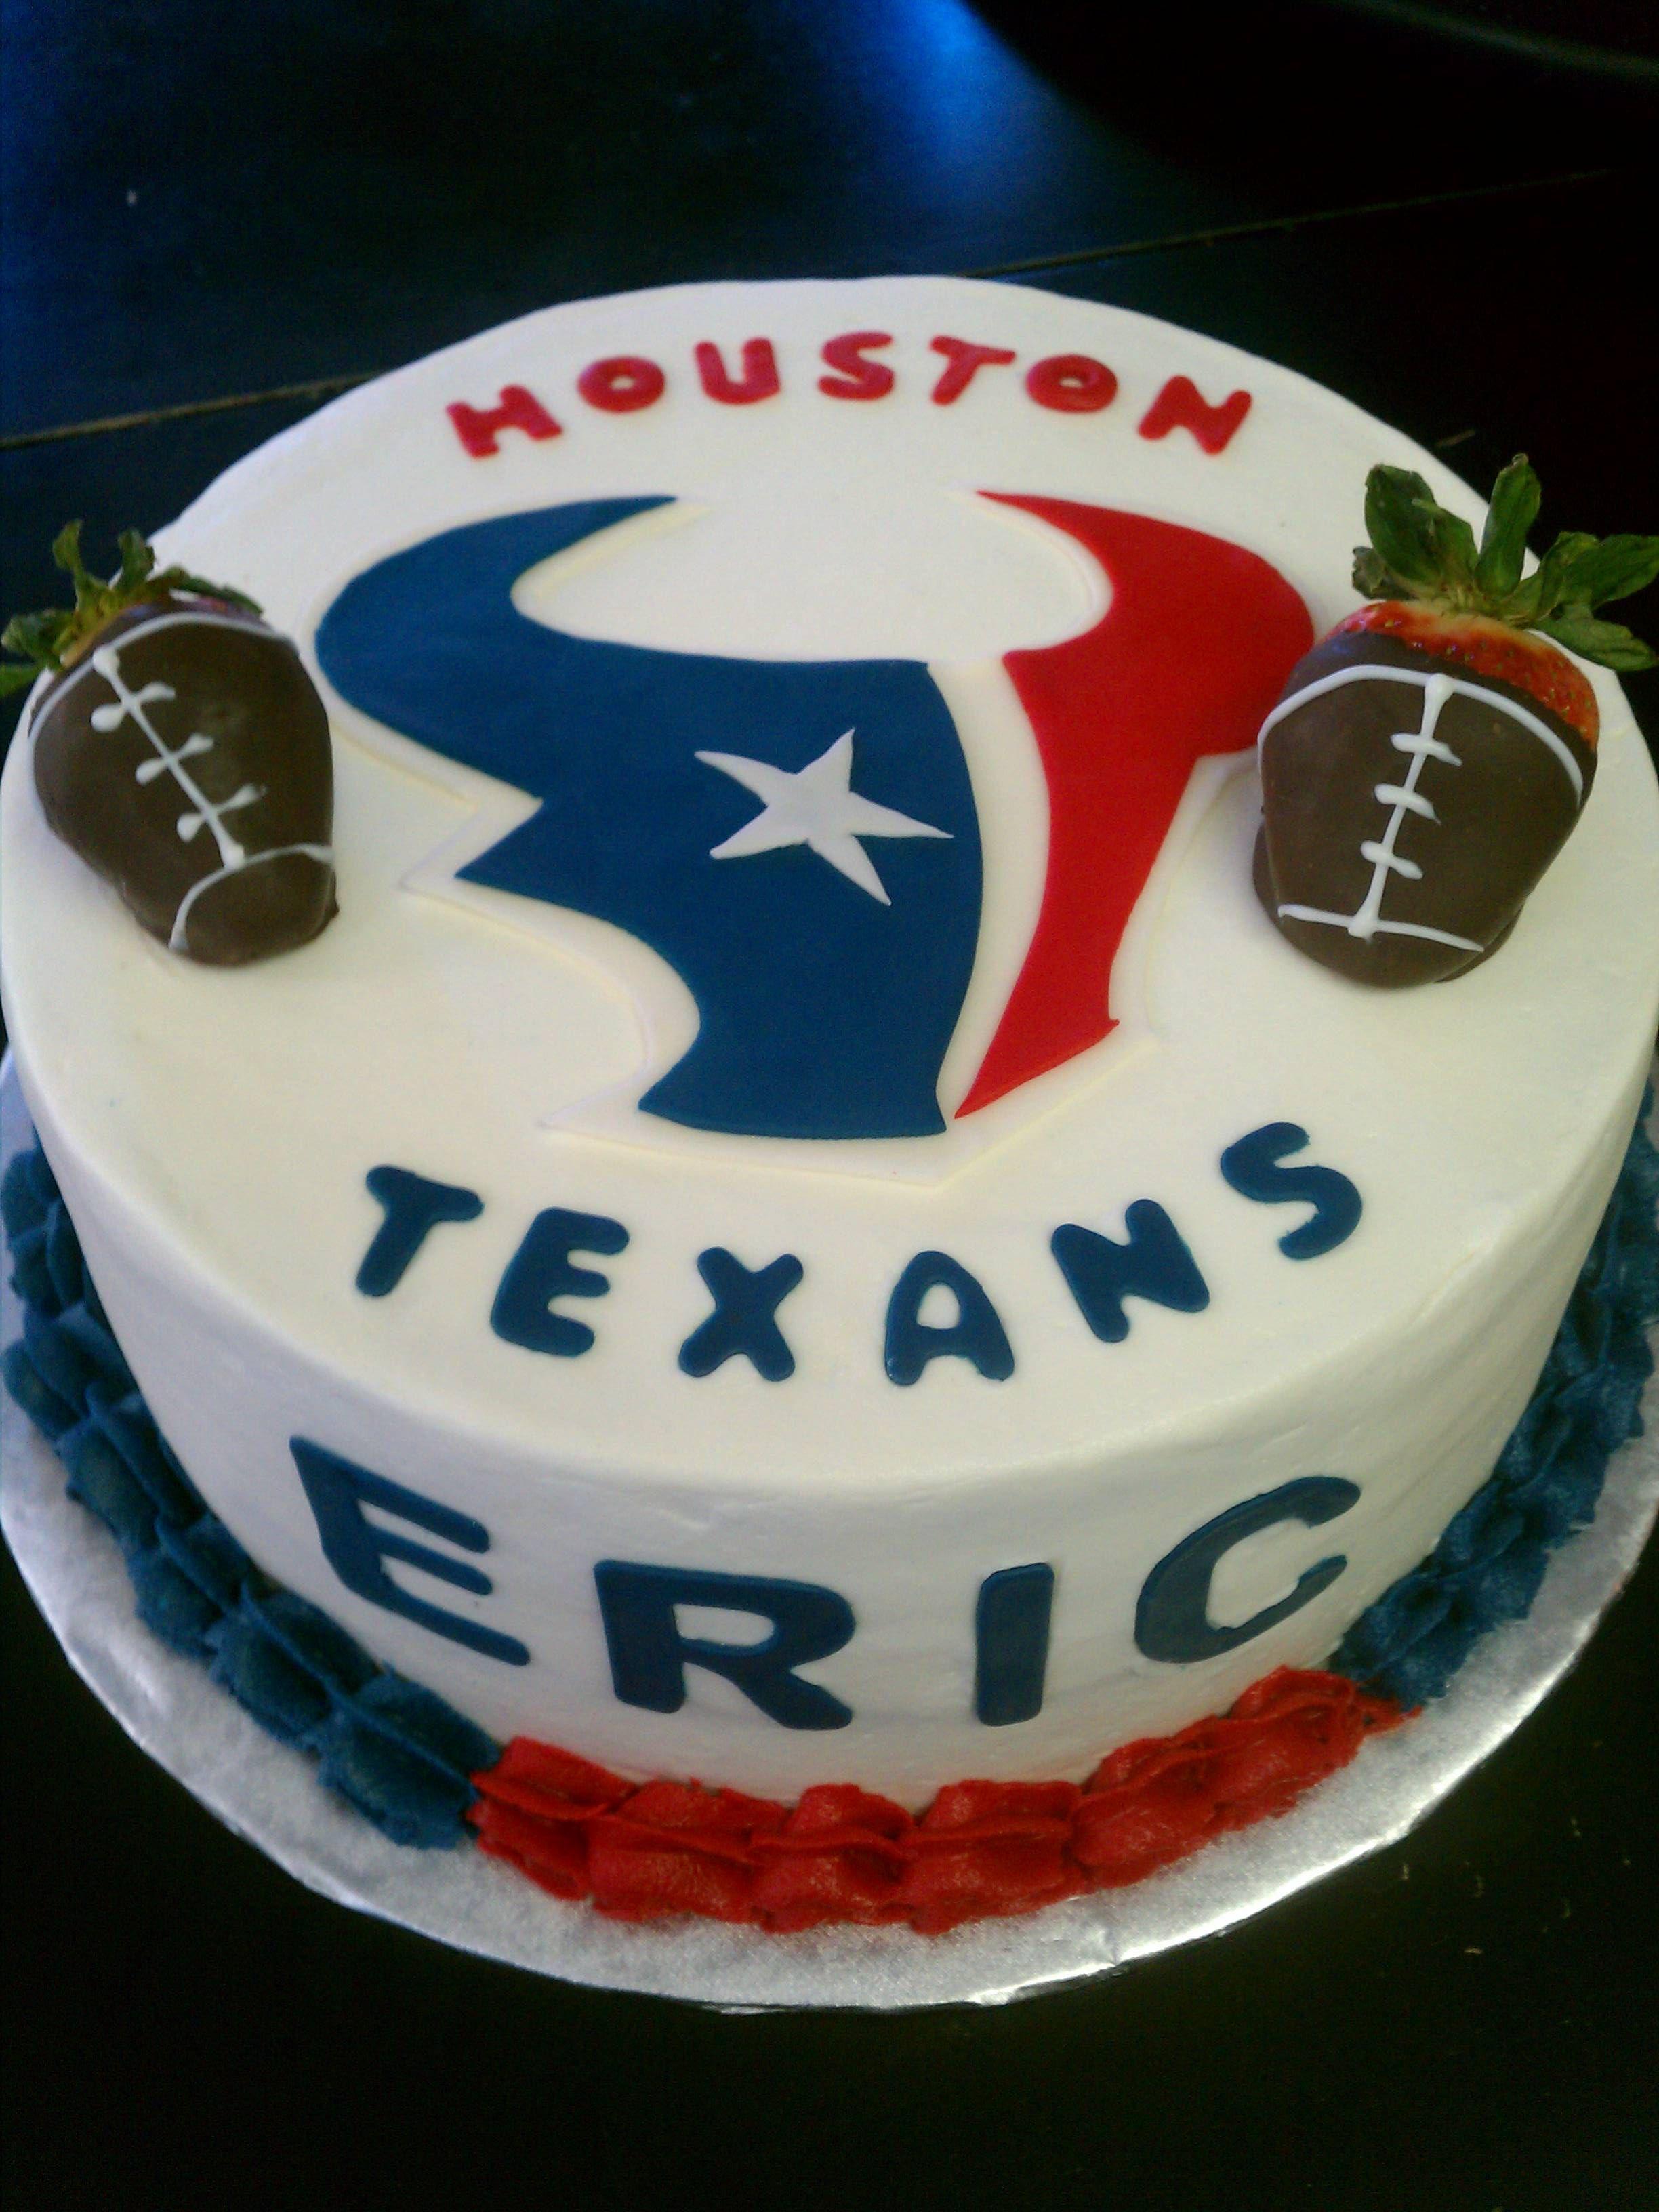 Houston texans texans cake houston texans cake sports